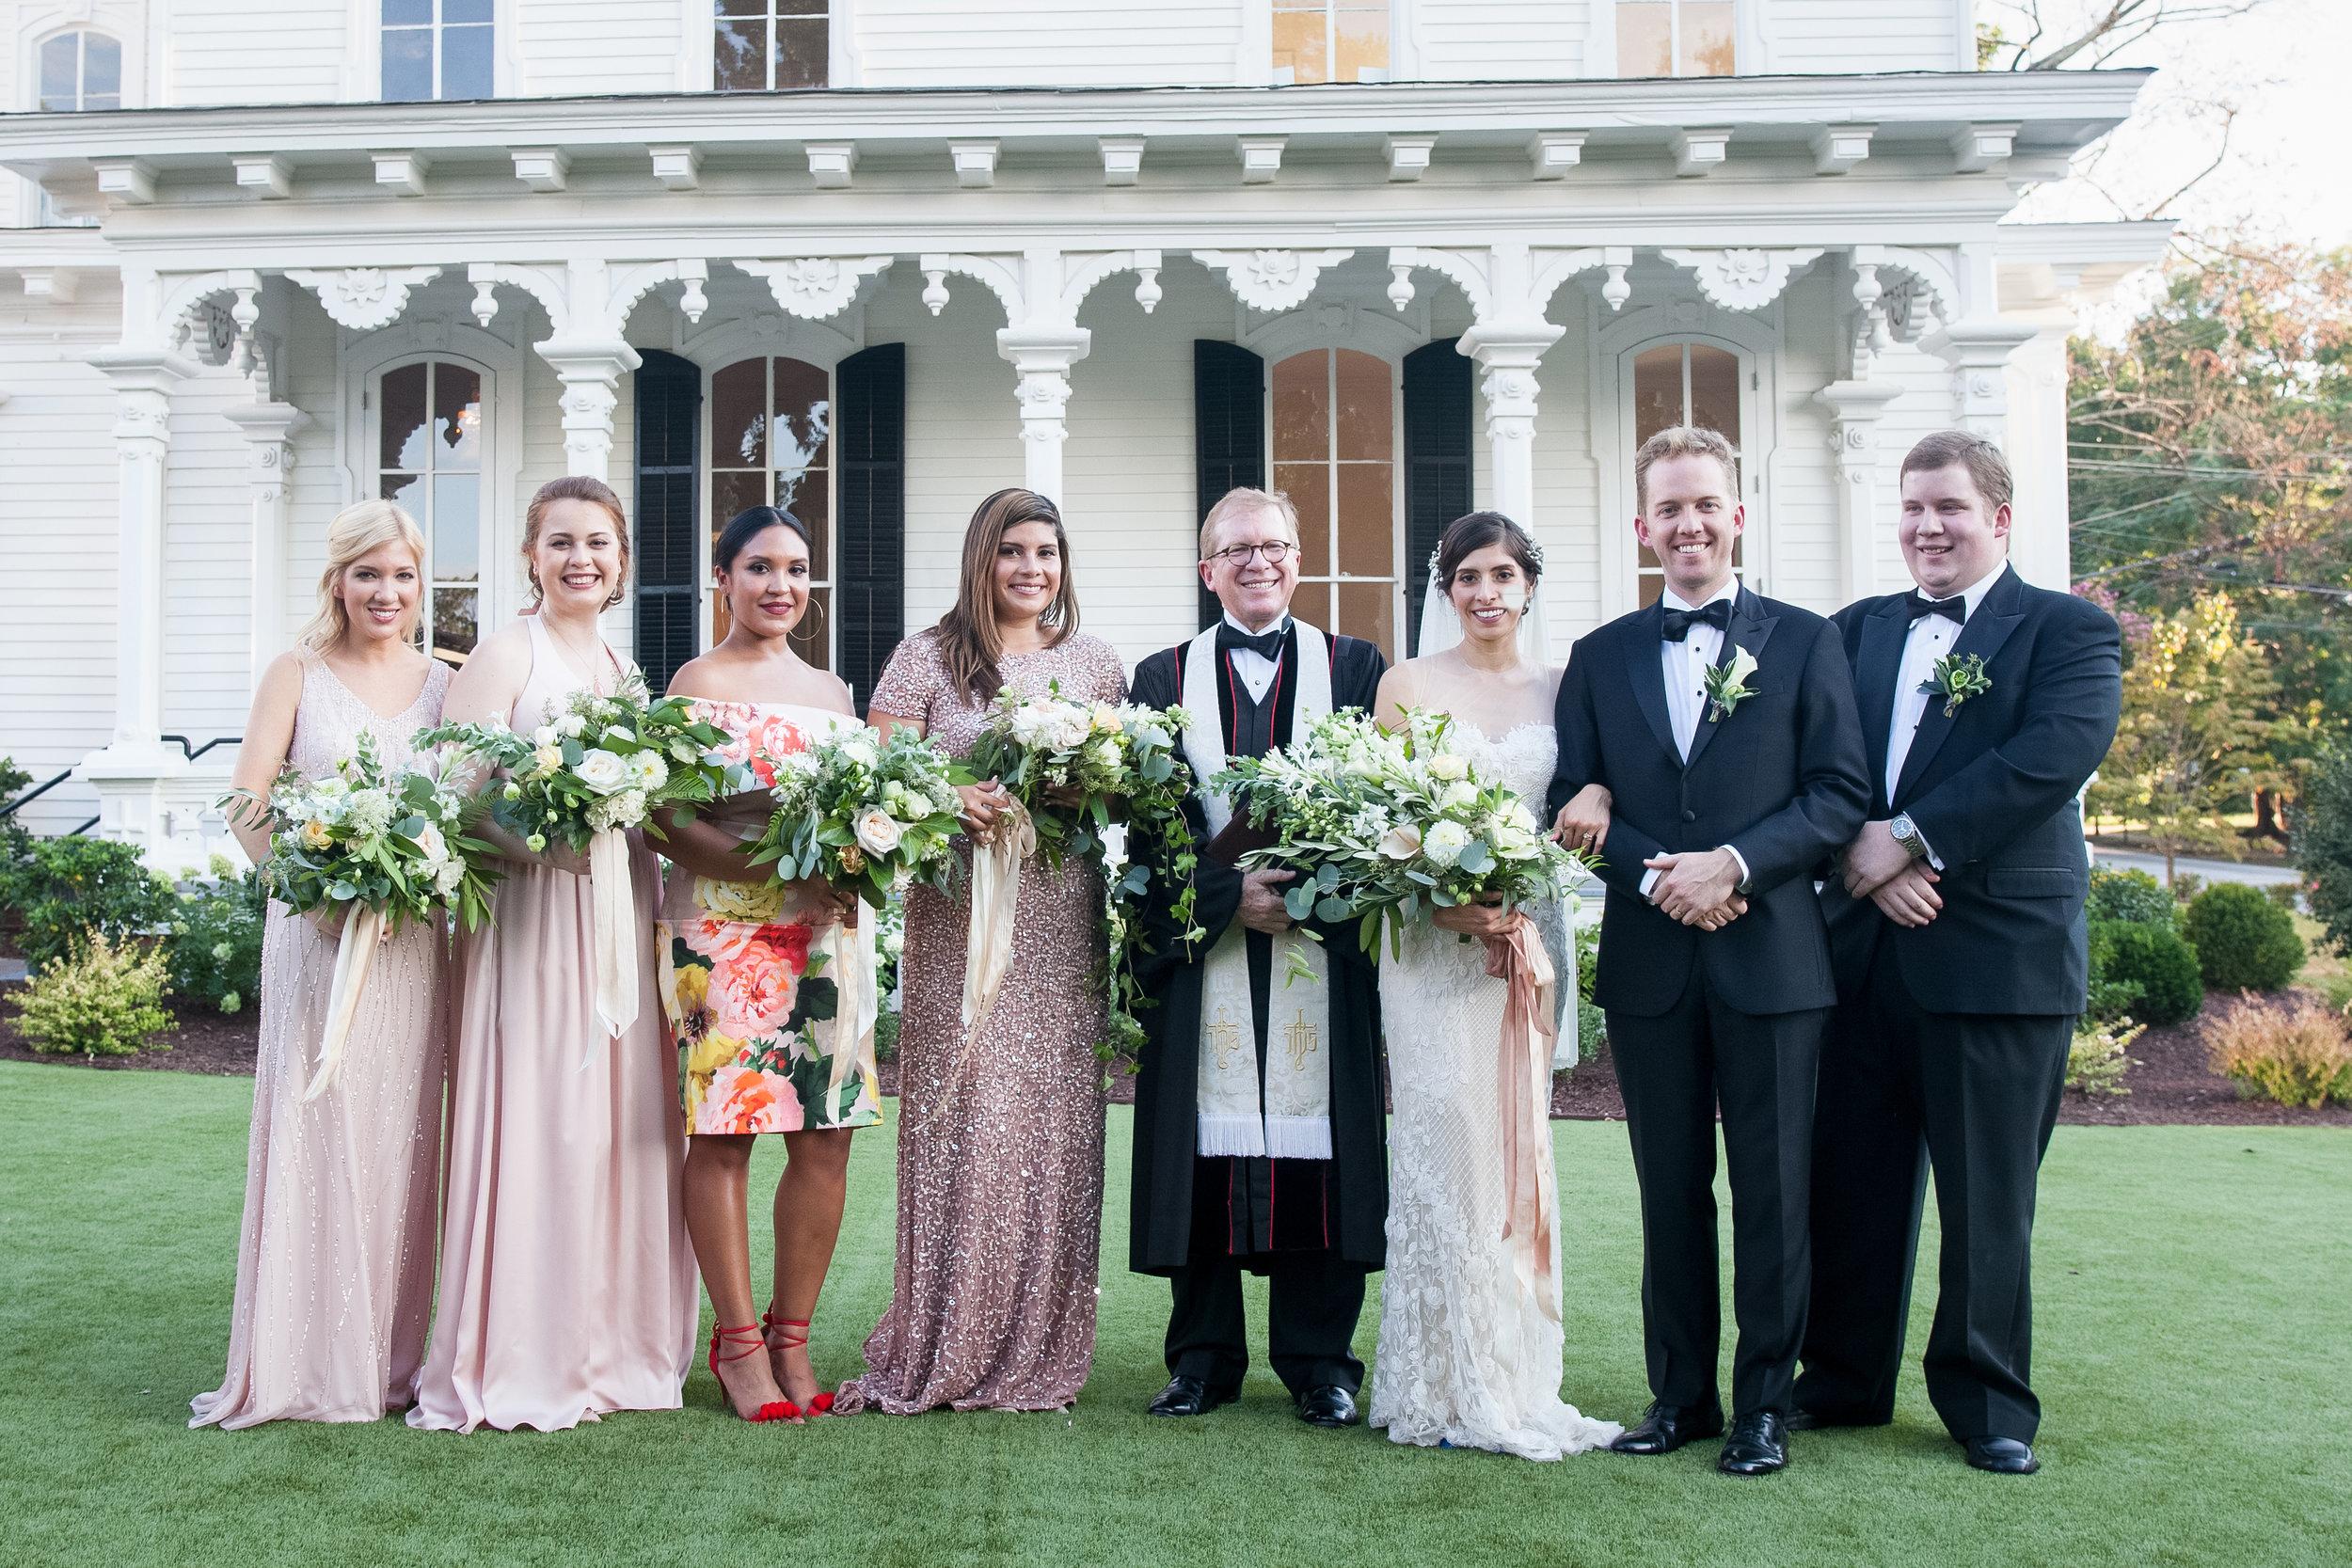 2016_08_20_rosalia_bill_wedding-15-EDIT.jpg